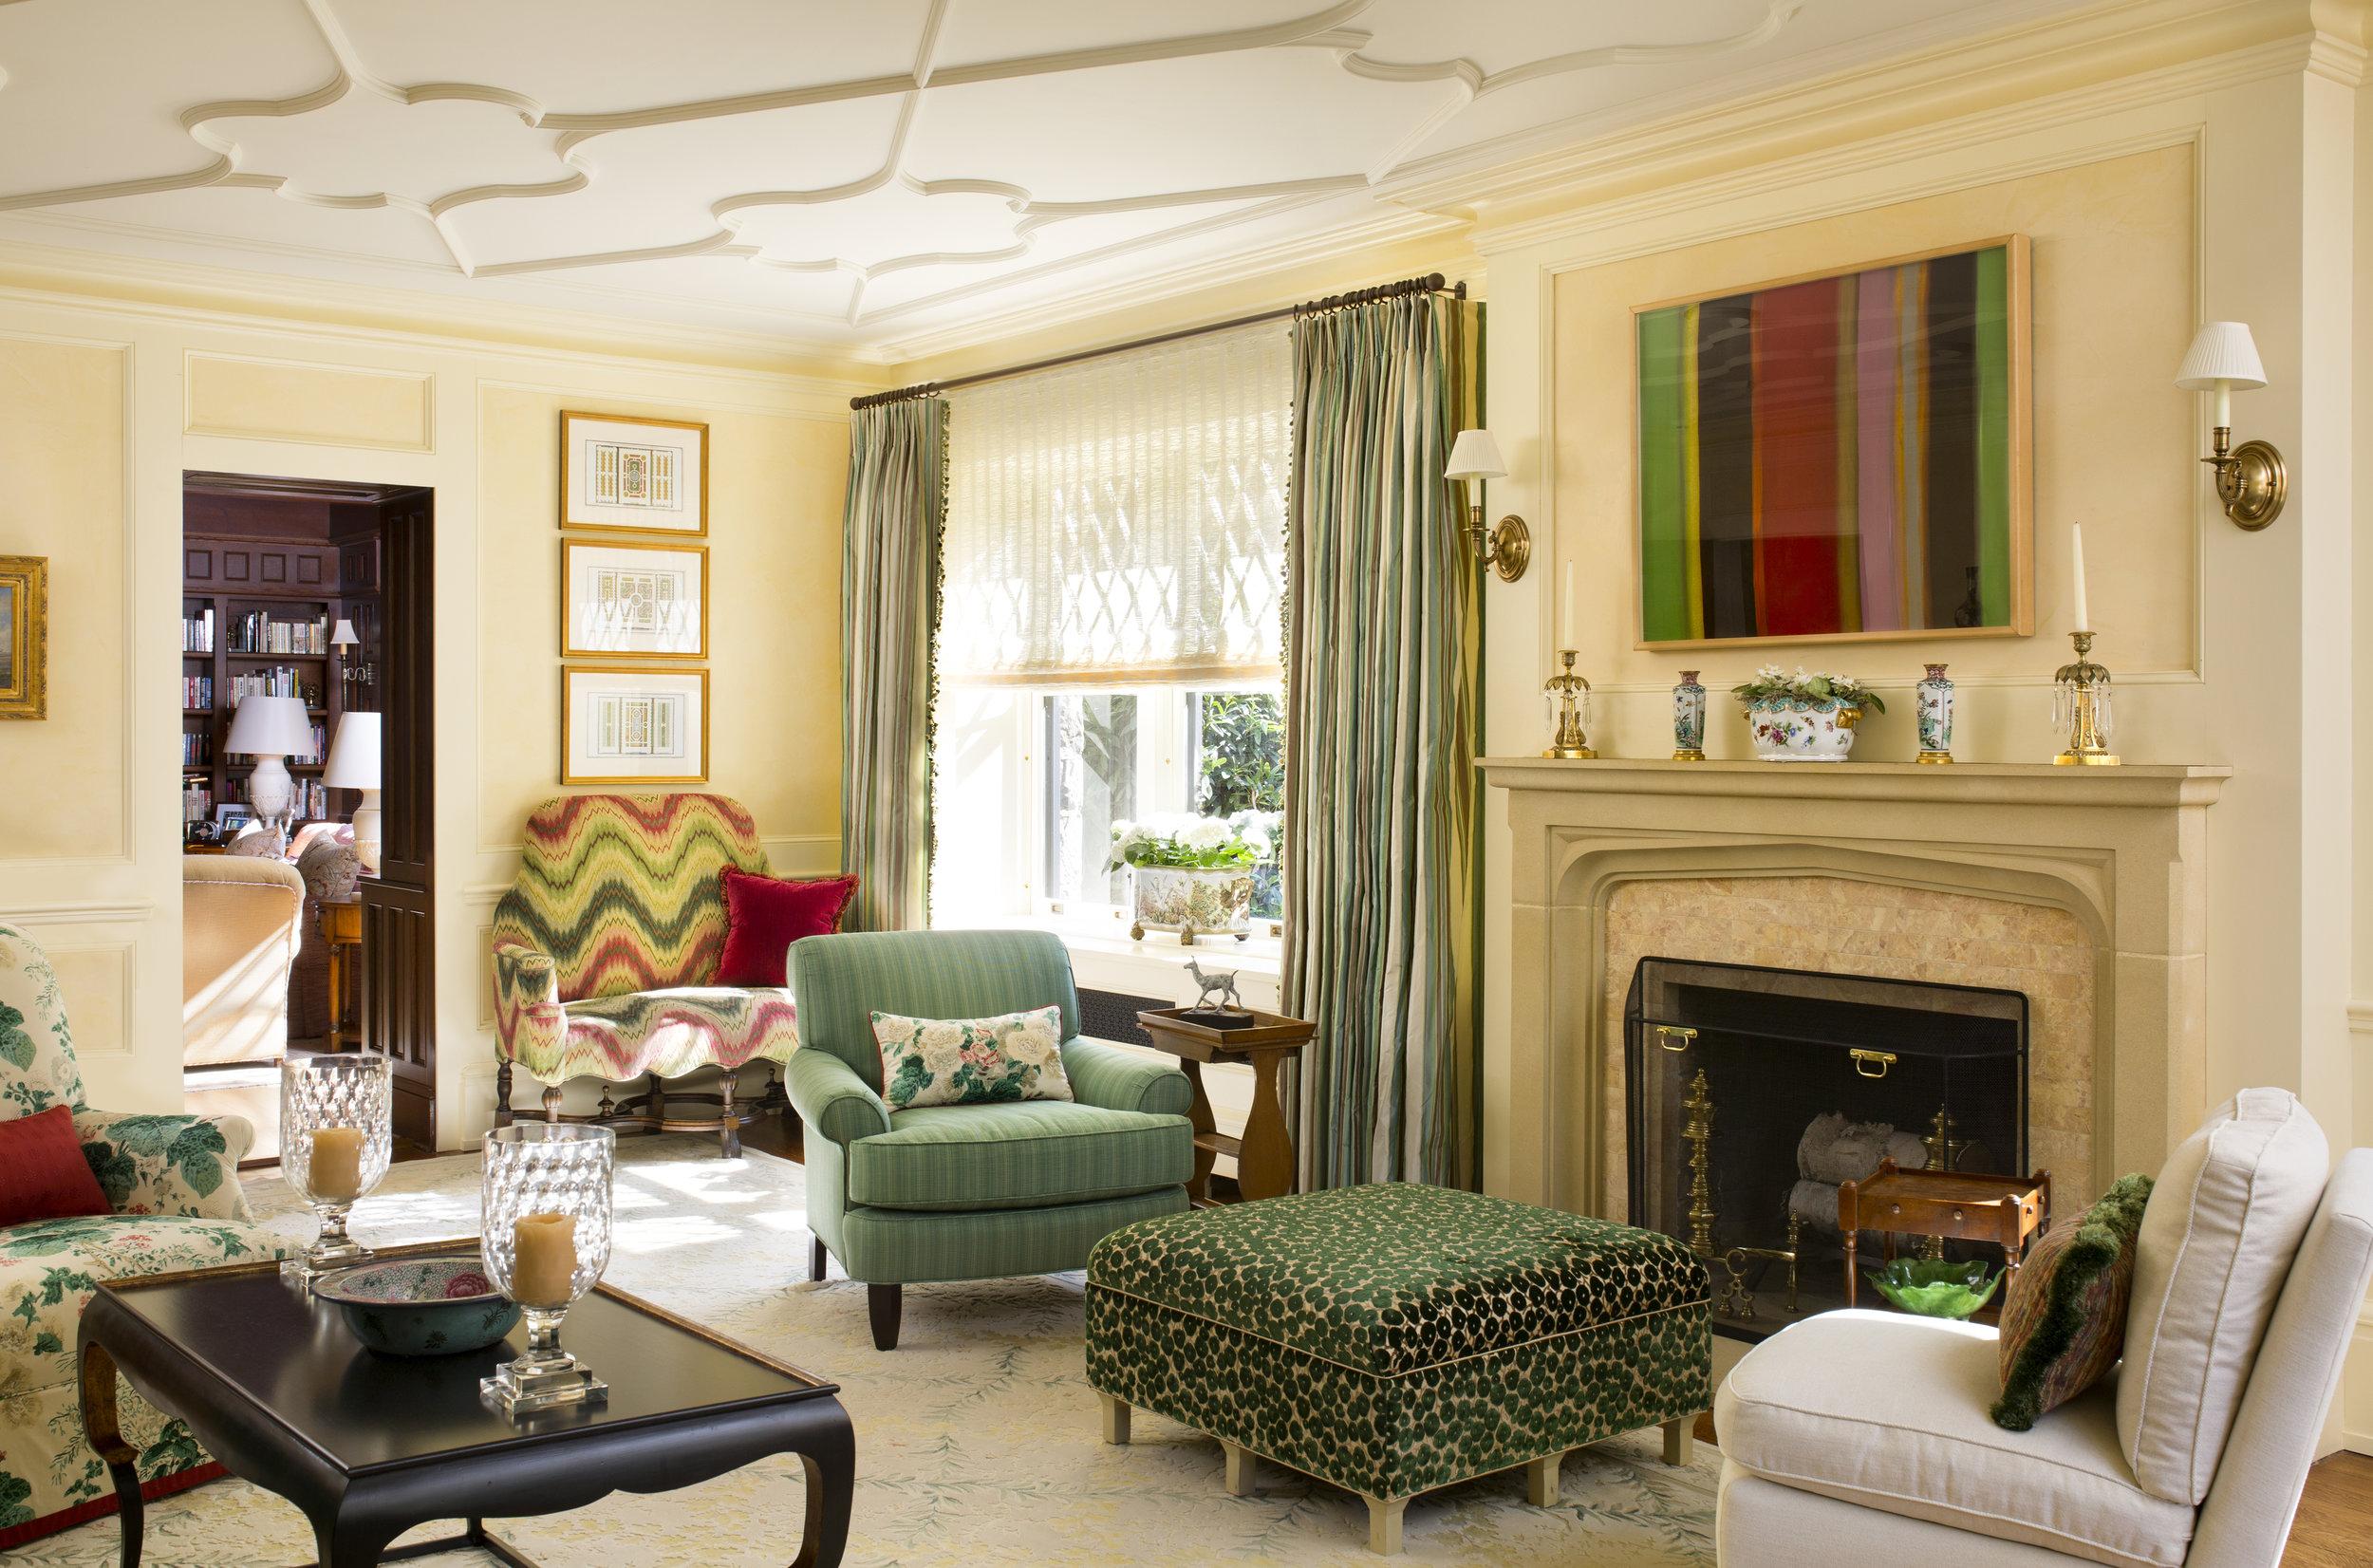 Wendy Lloyd Interior Design | Princeton, New Jersey | Tudor Revival Home Remodel